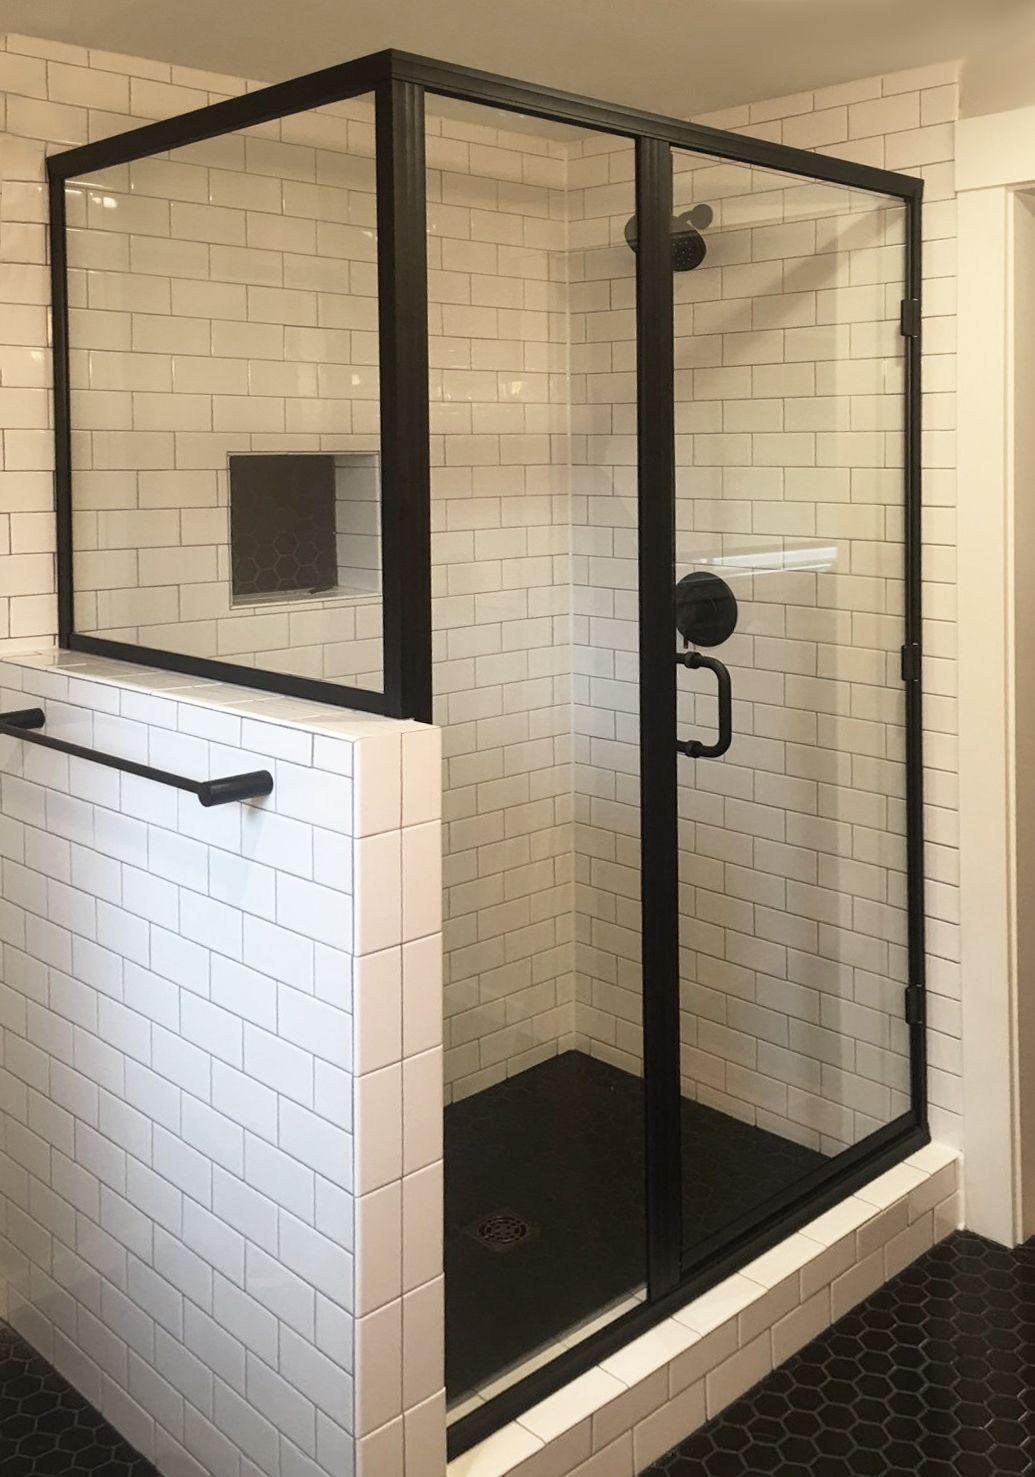 Get Glass Shower Doors Panels Tile Lines In 2020 Shower